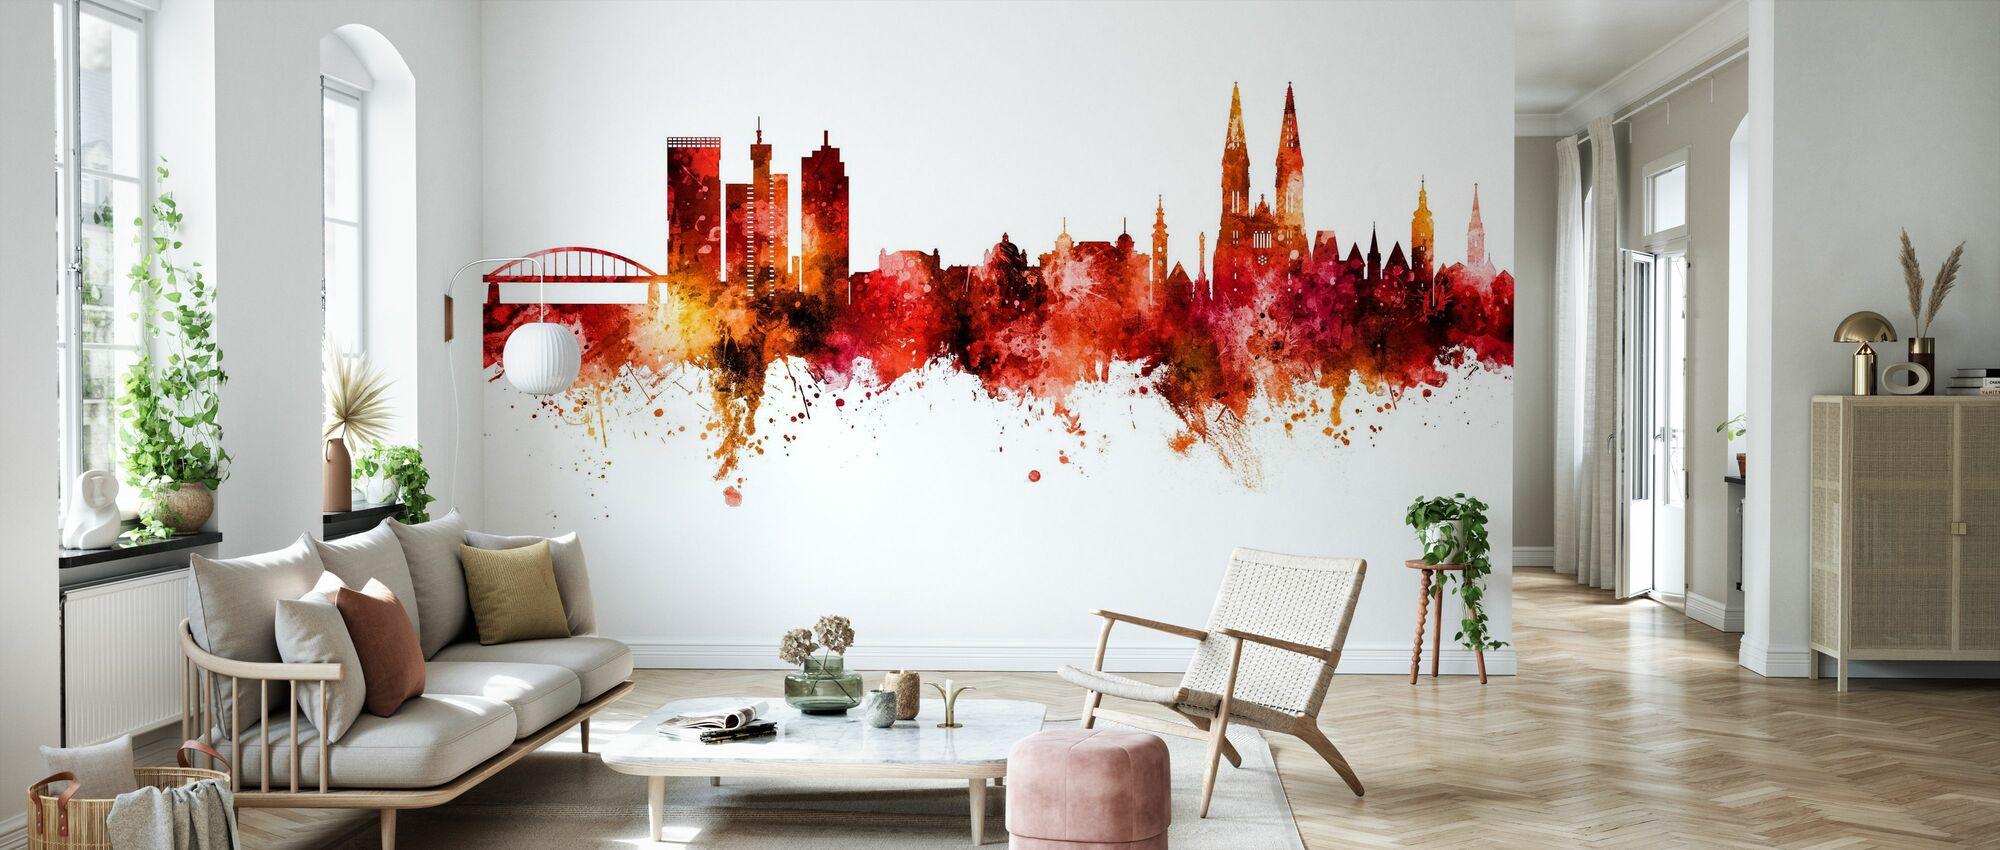 Zagreb Croatia Skyline - Wallpaper - Living Room